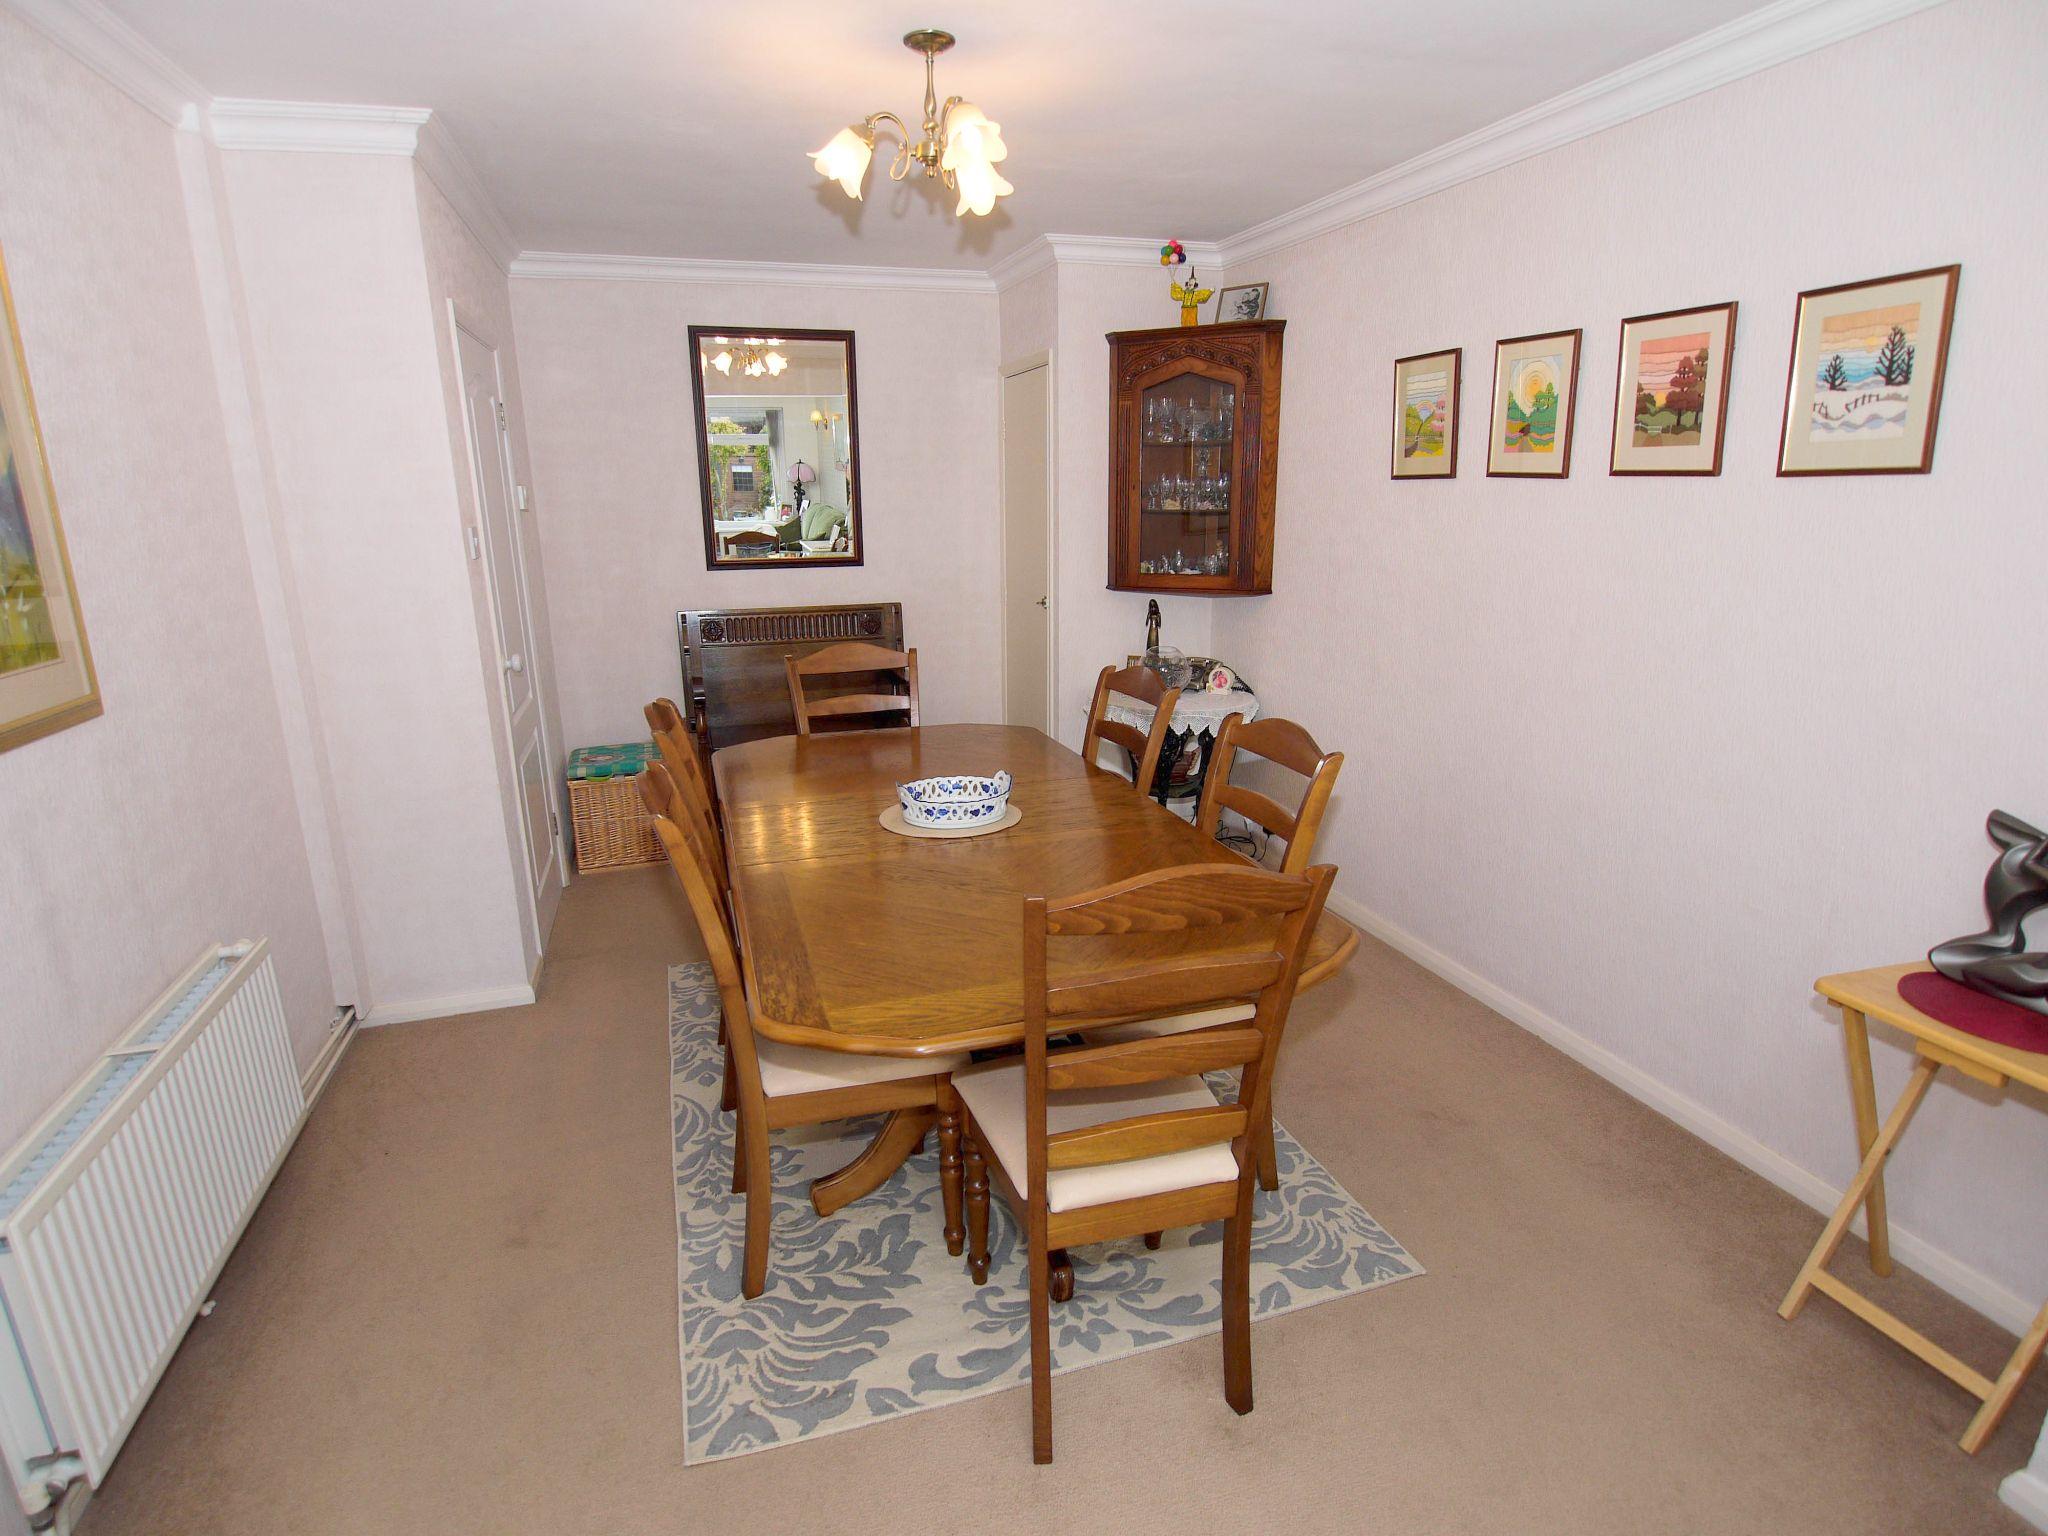 3 bedroom detached bungalow Sold in Sevenoaks - Photograph 5